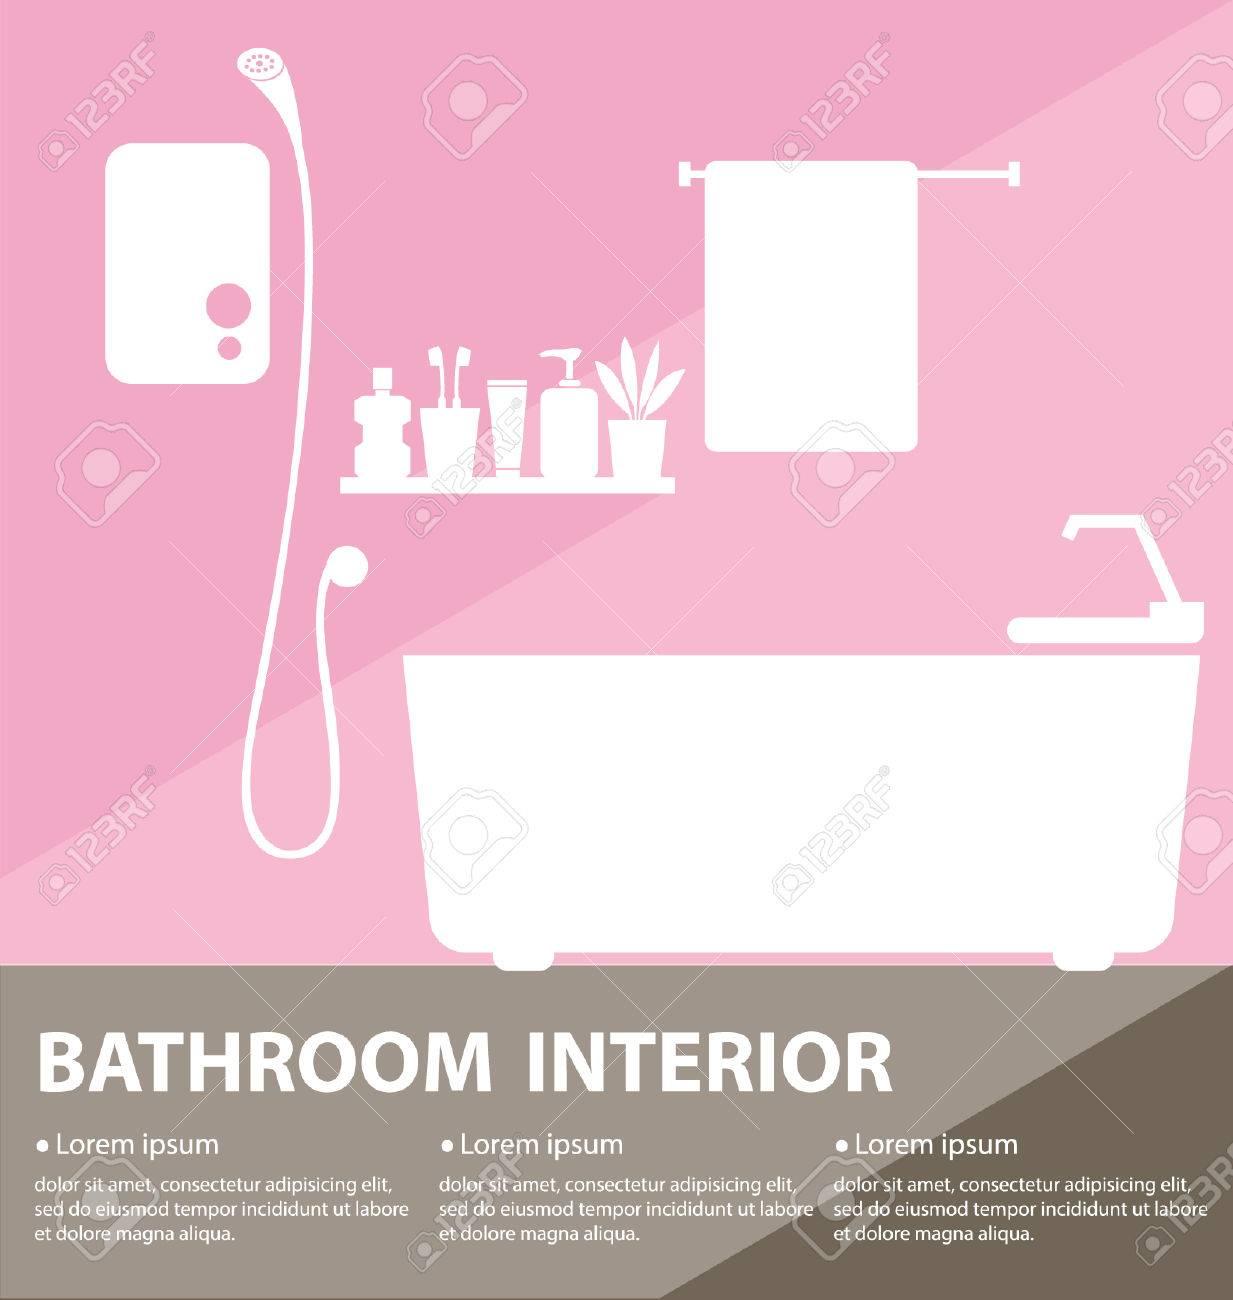 Bathroom interior vector illustration Stock Vector - 25935507